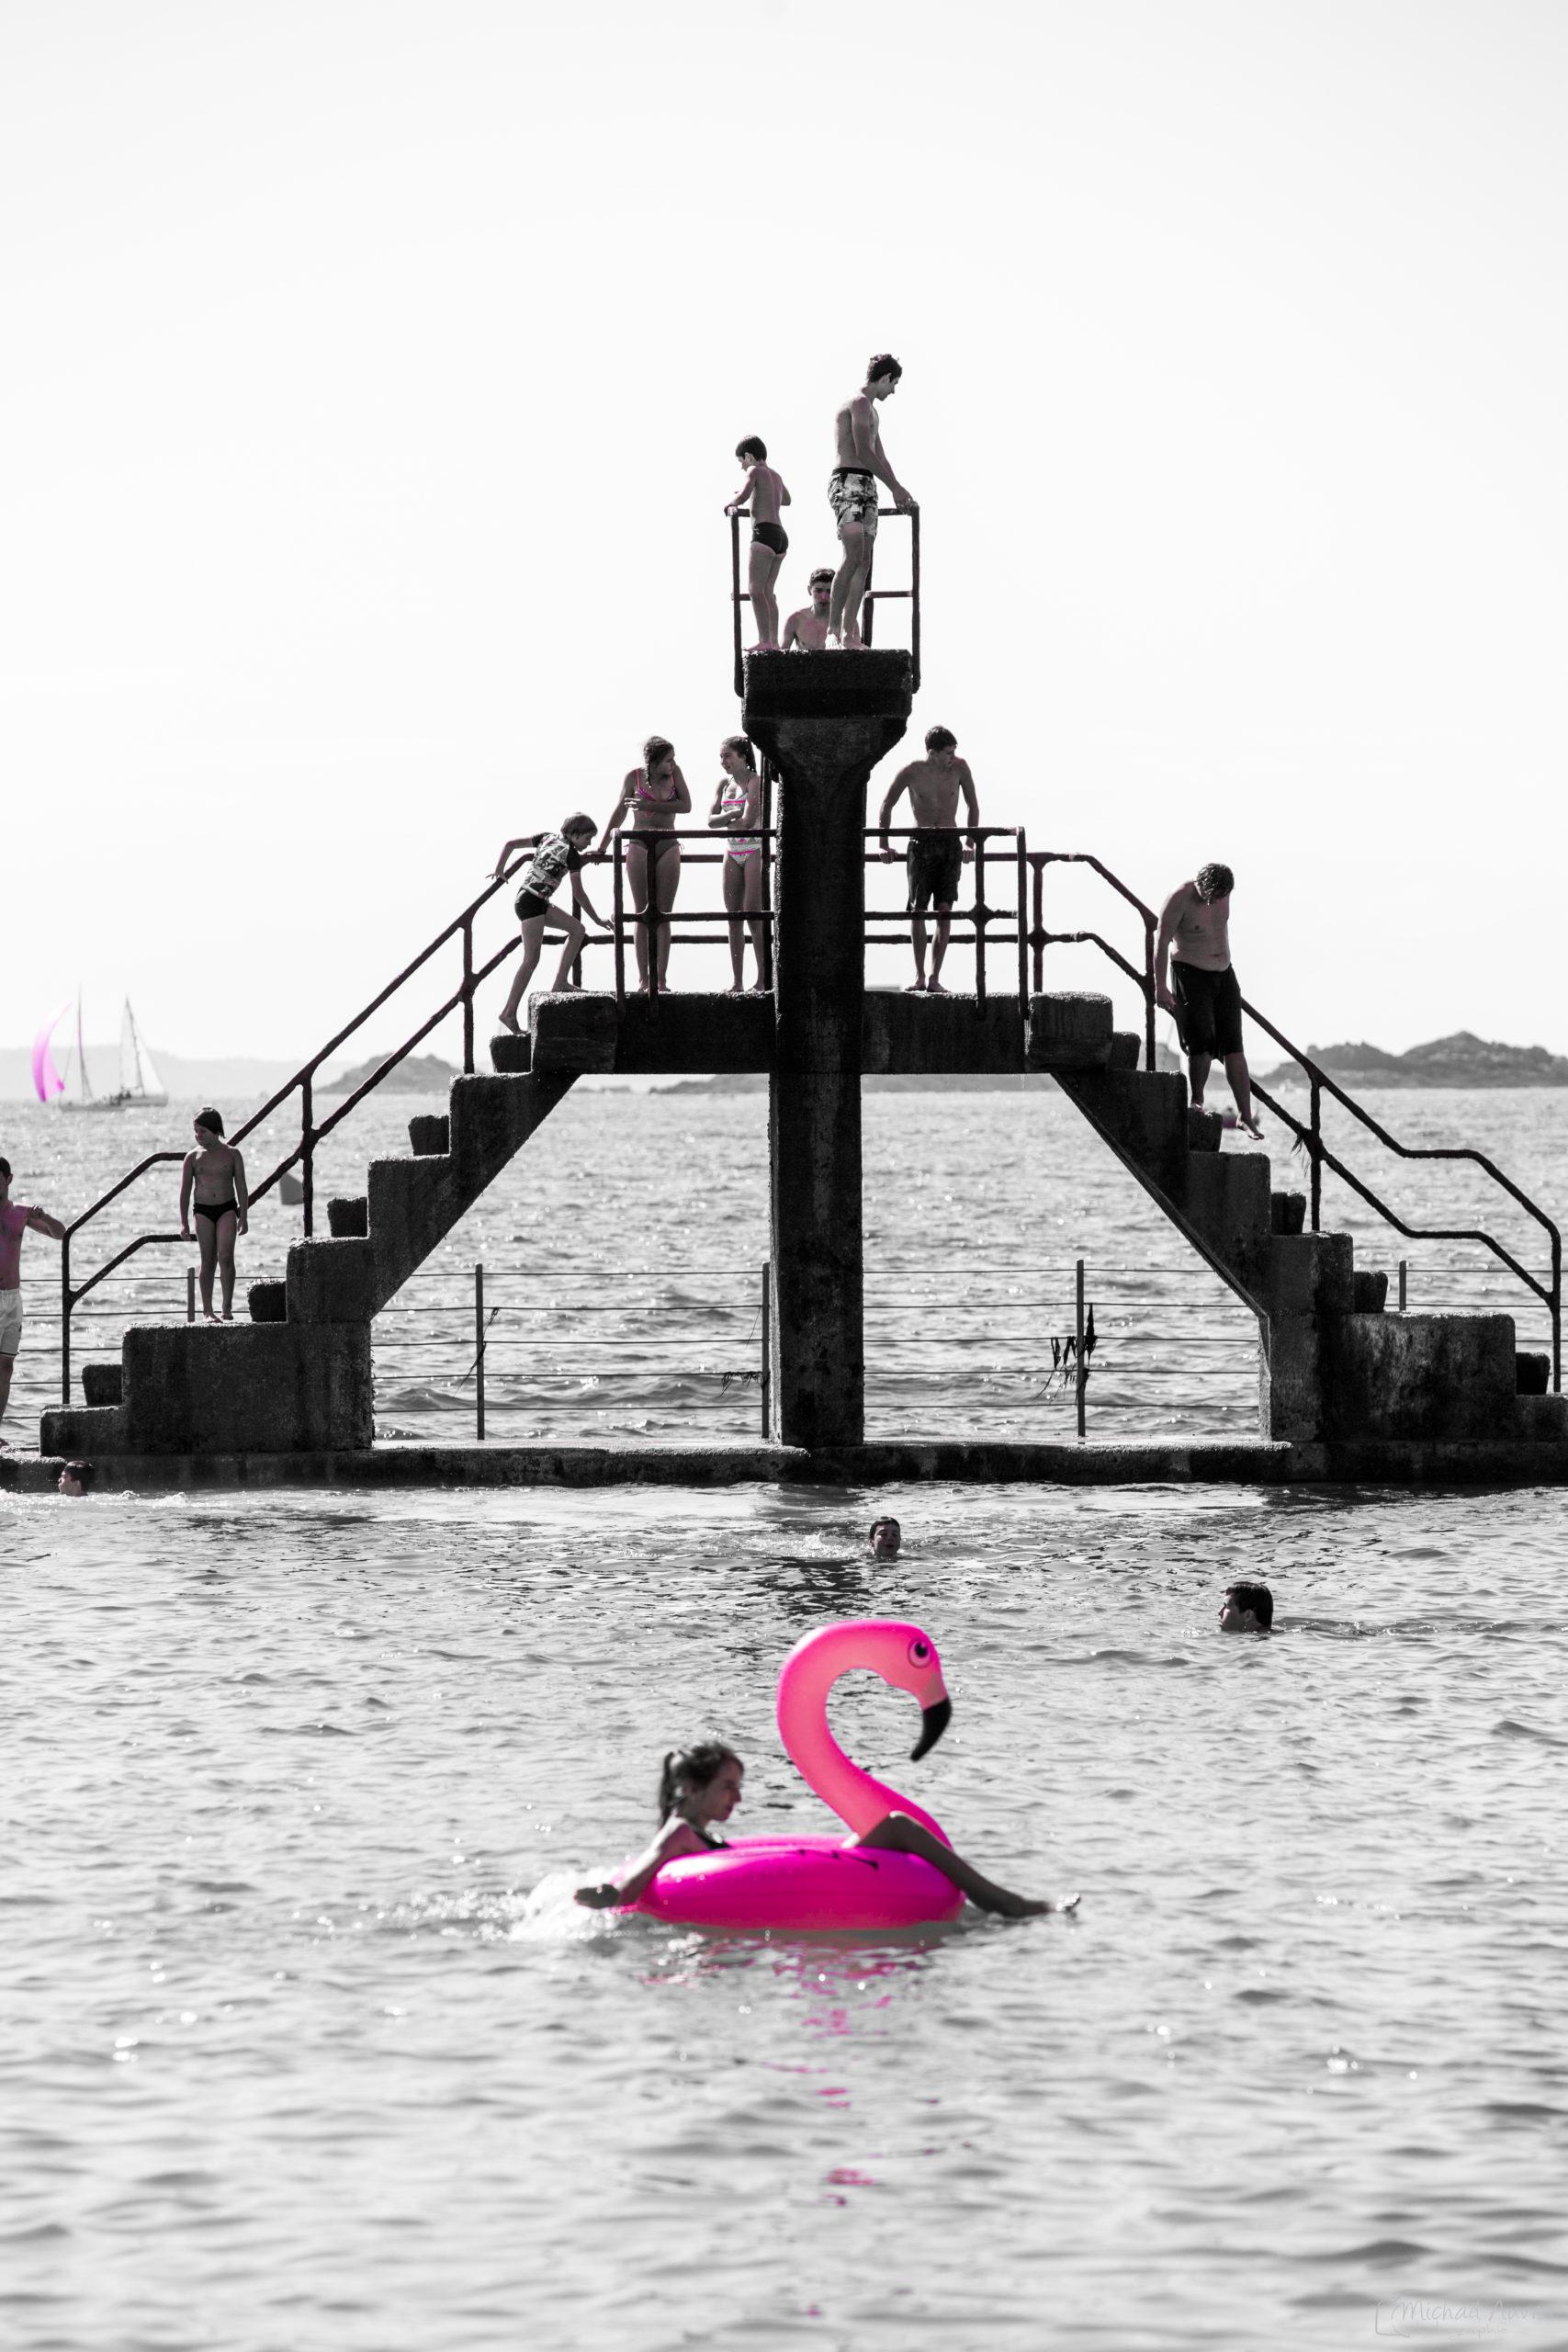 plongeoir piscine bon-secours saint-malo flamand-rose